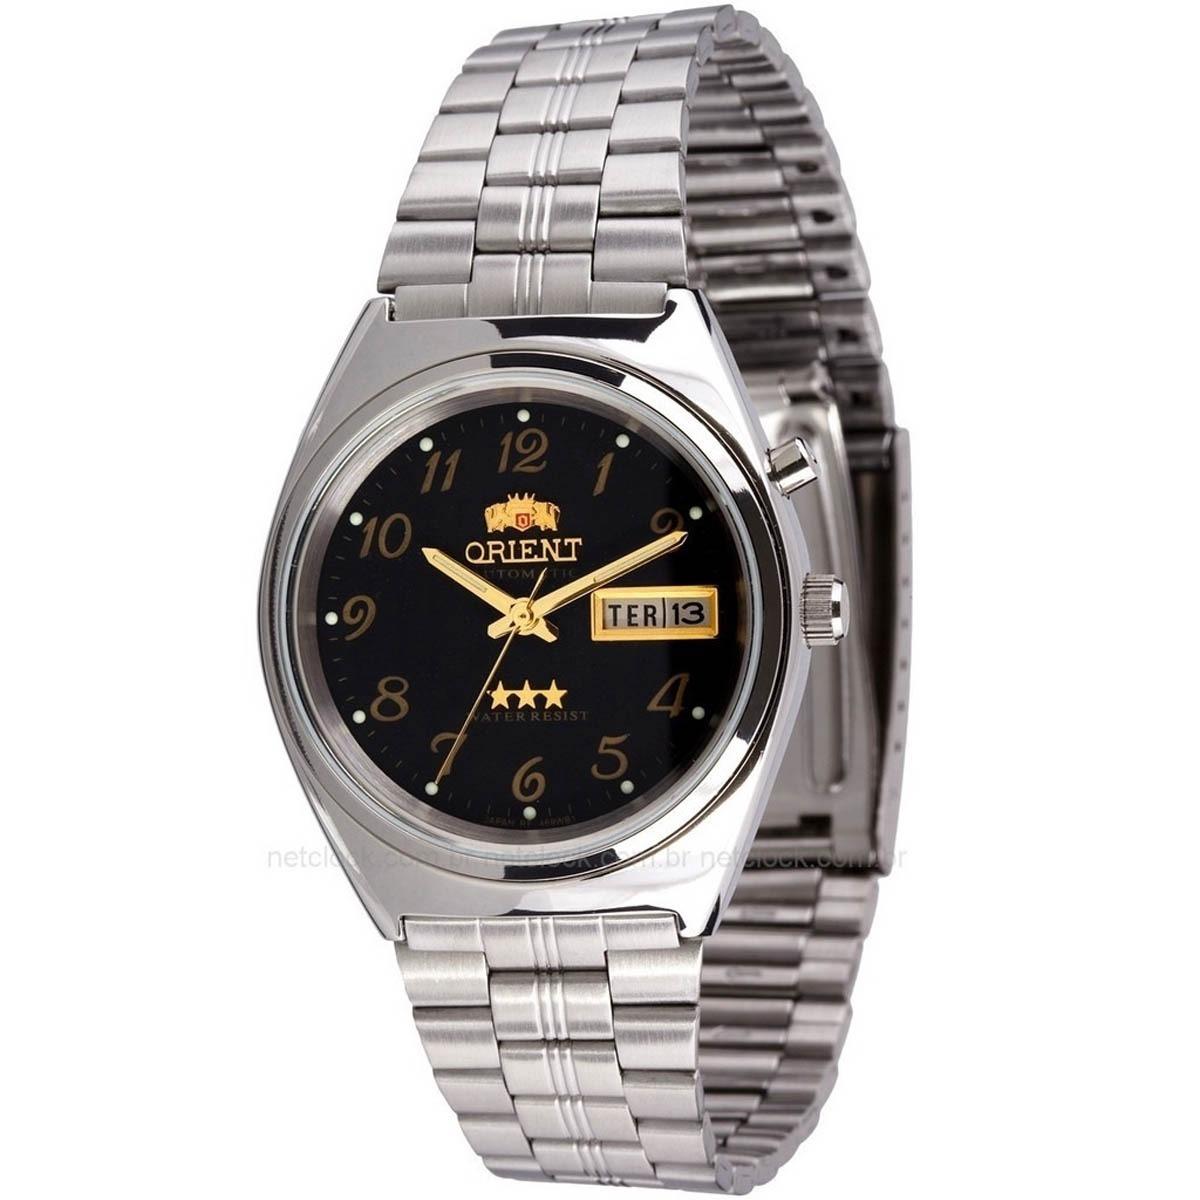 7f614a655 Relógio Orient Automático Analógico Classic Masculino 469wb1 - R ...